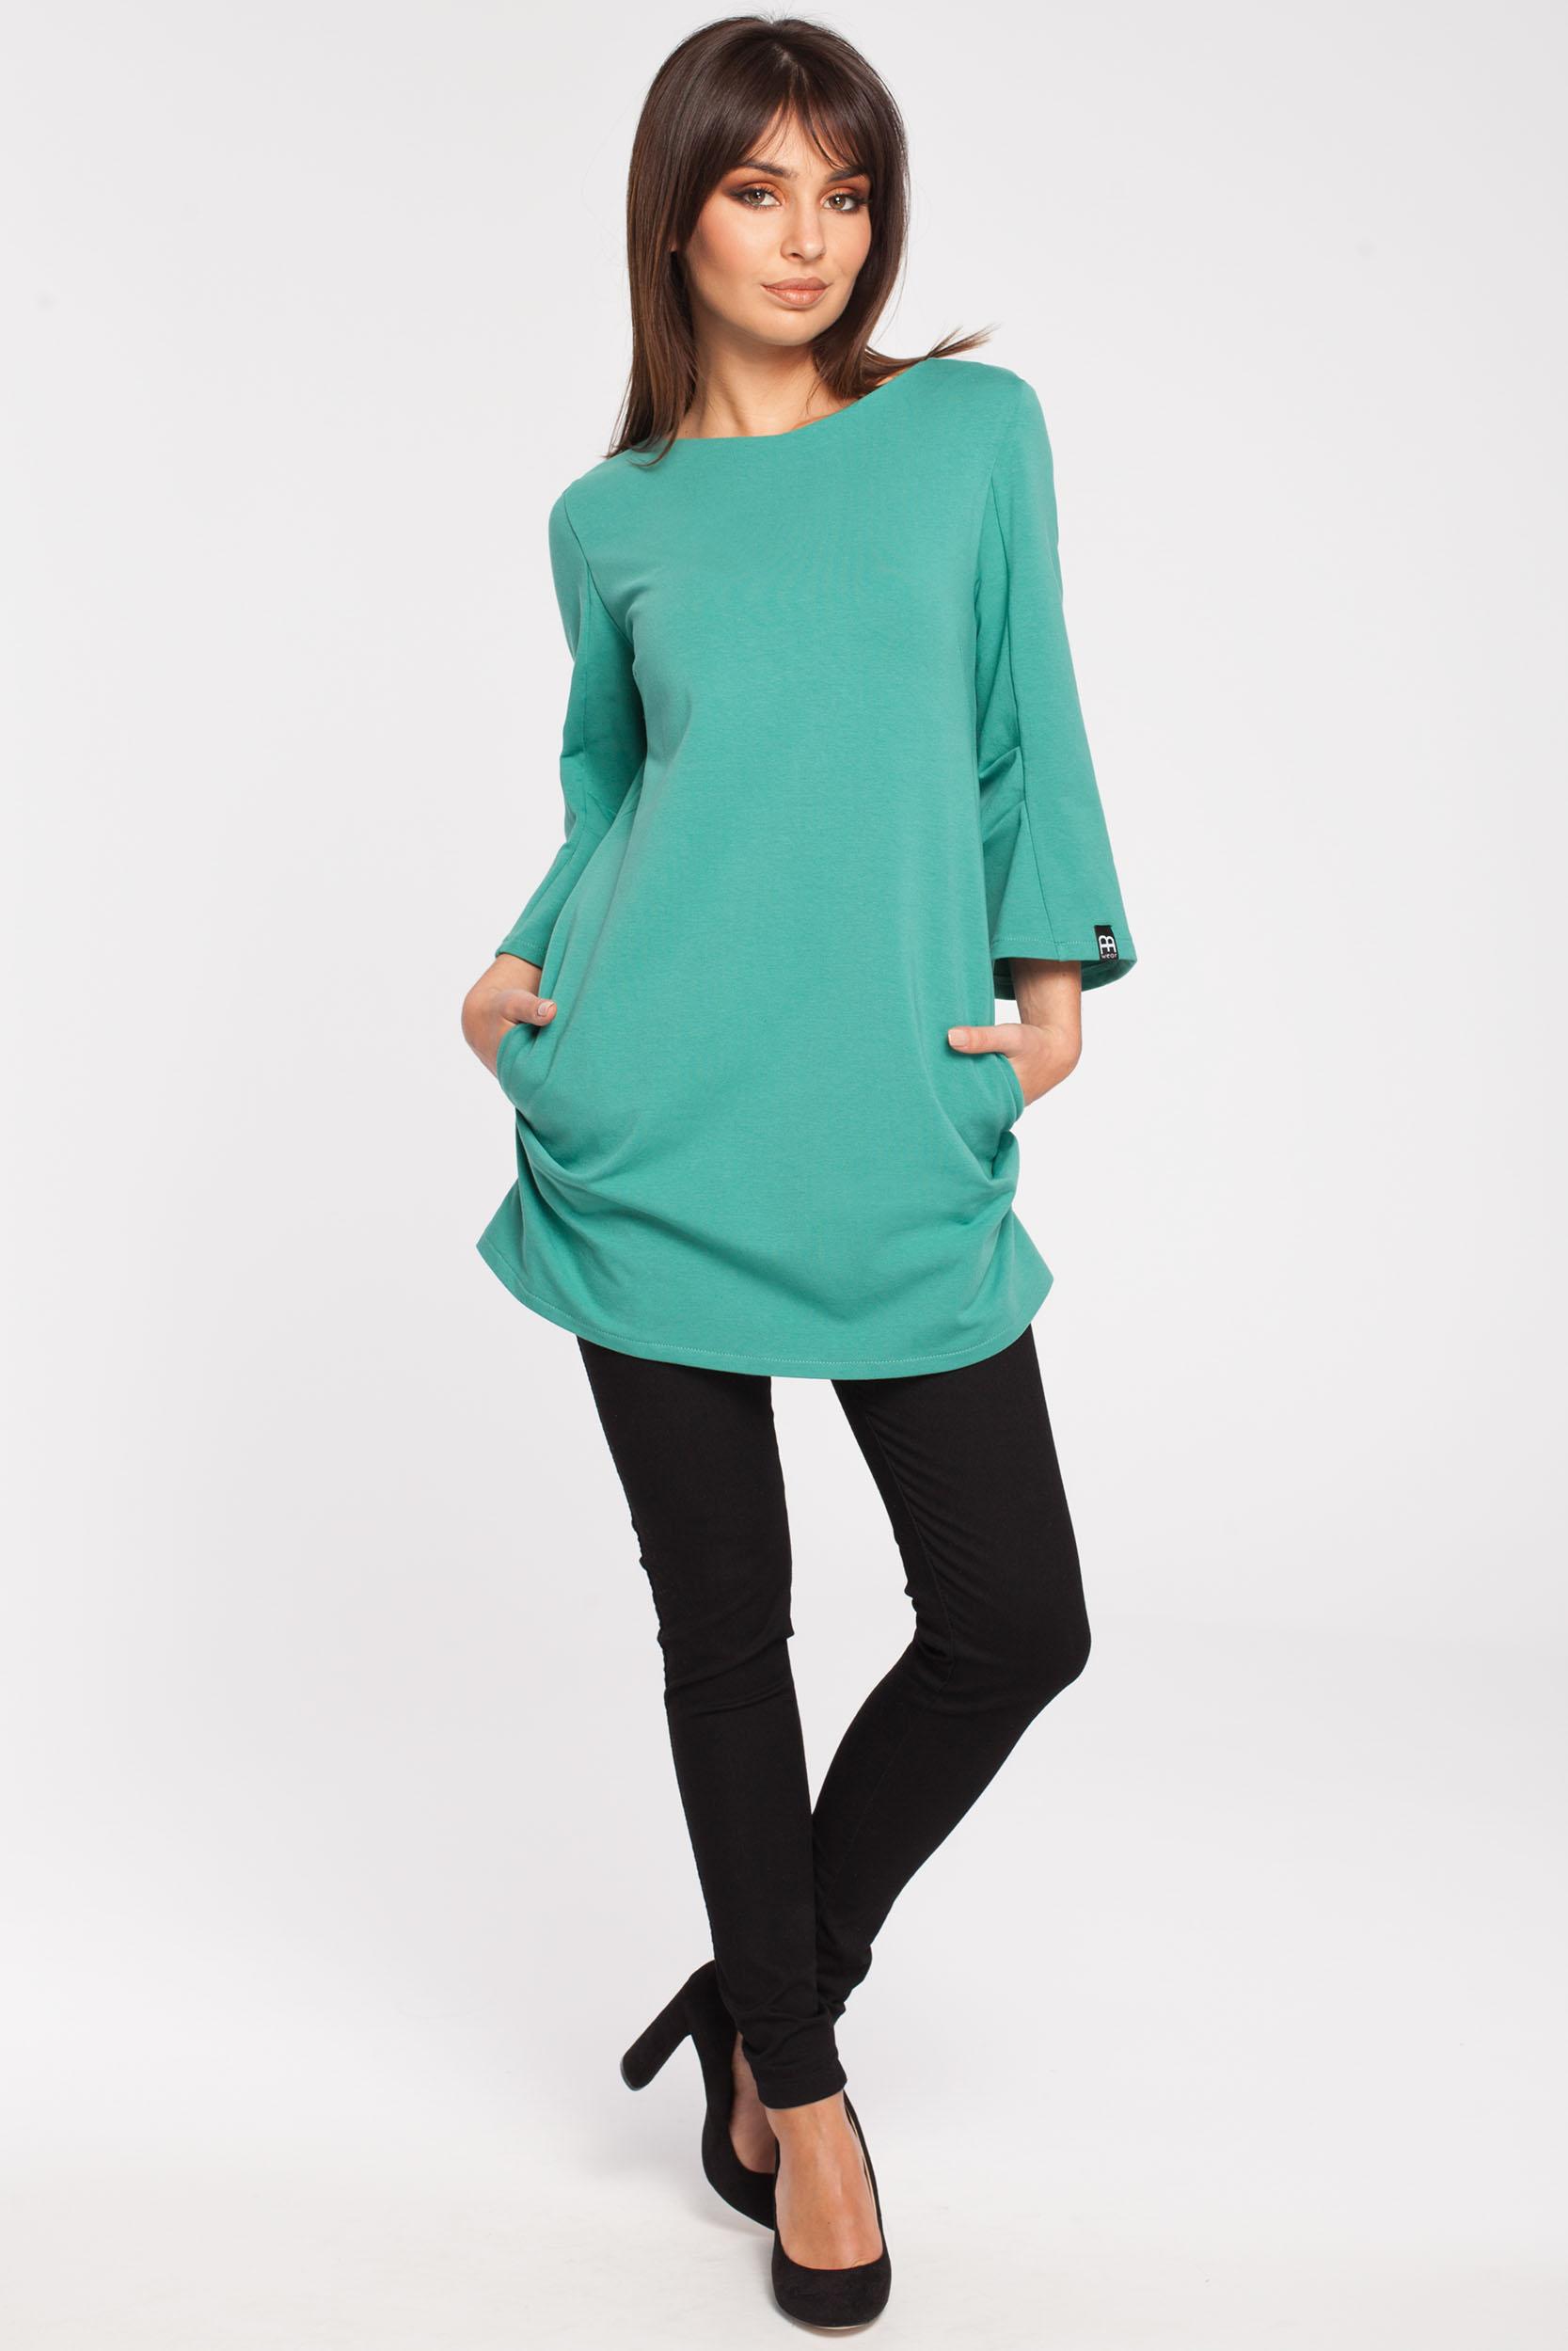 CM2867 Gładka elegancka tunika - zielona